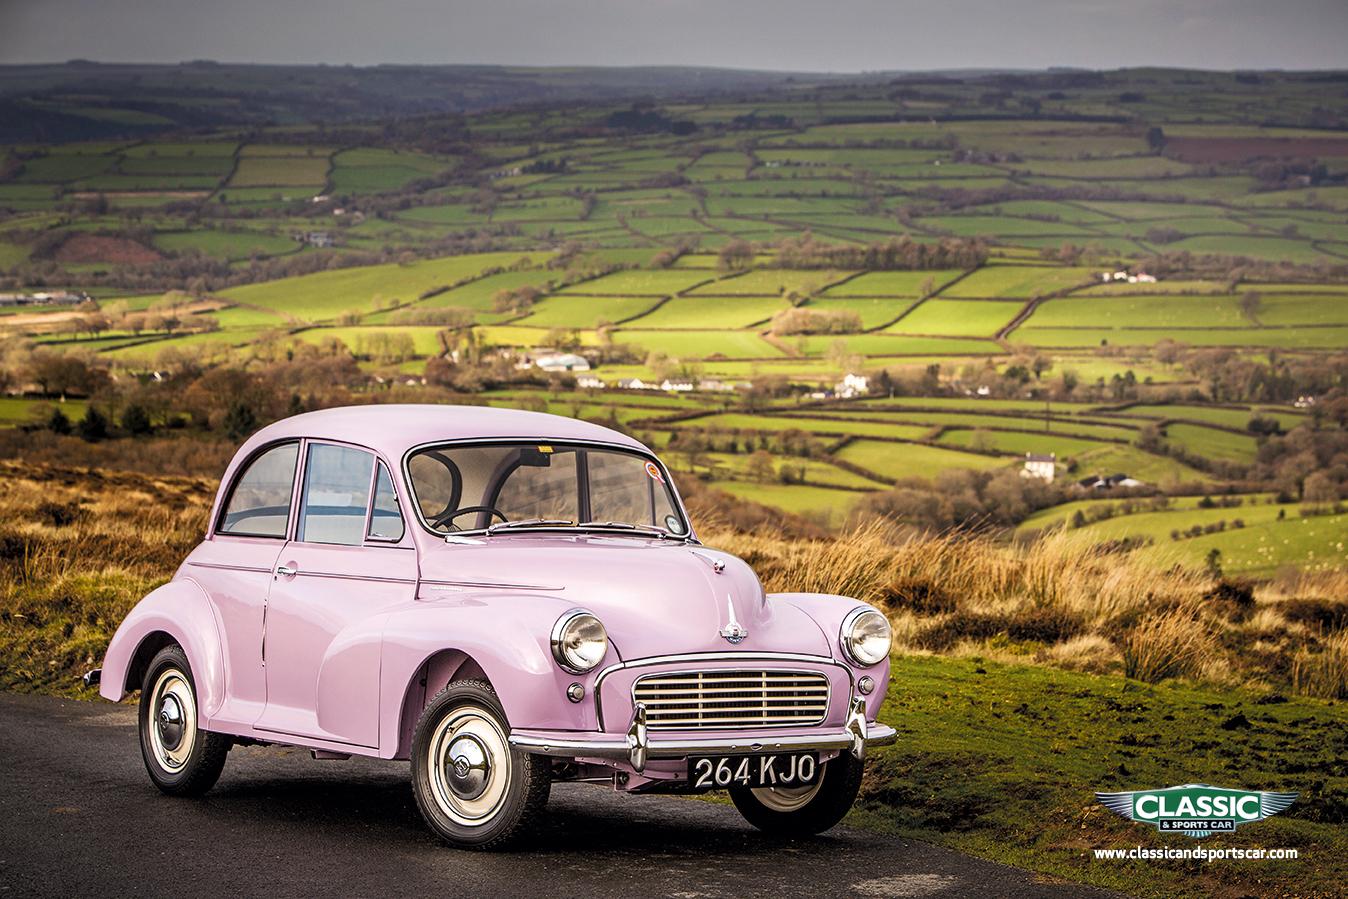 Best desktop wallpapers cars february 2017 classic sports car - Best classic wallpaper ...